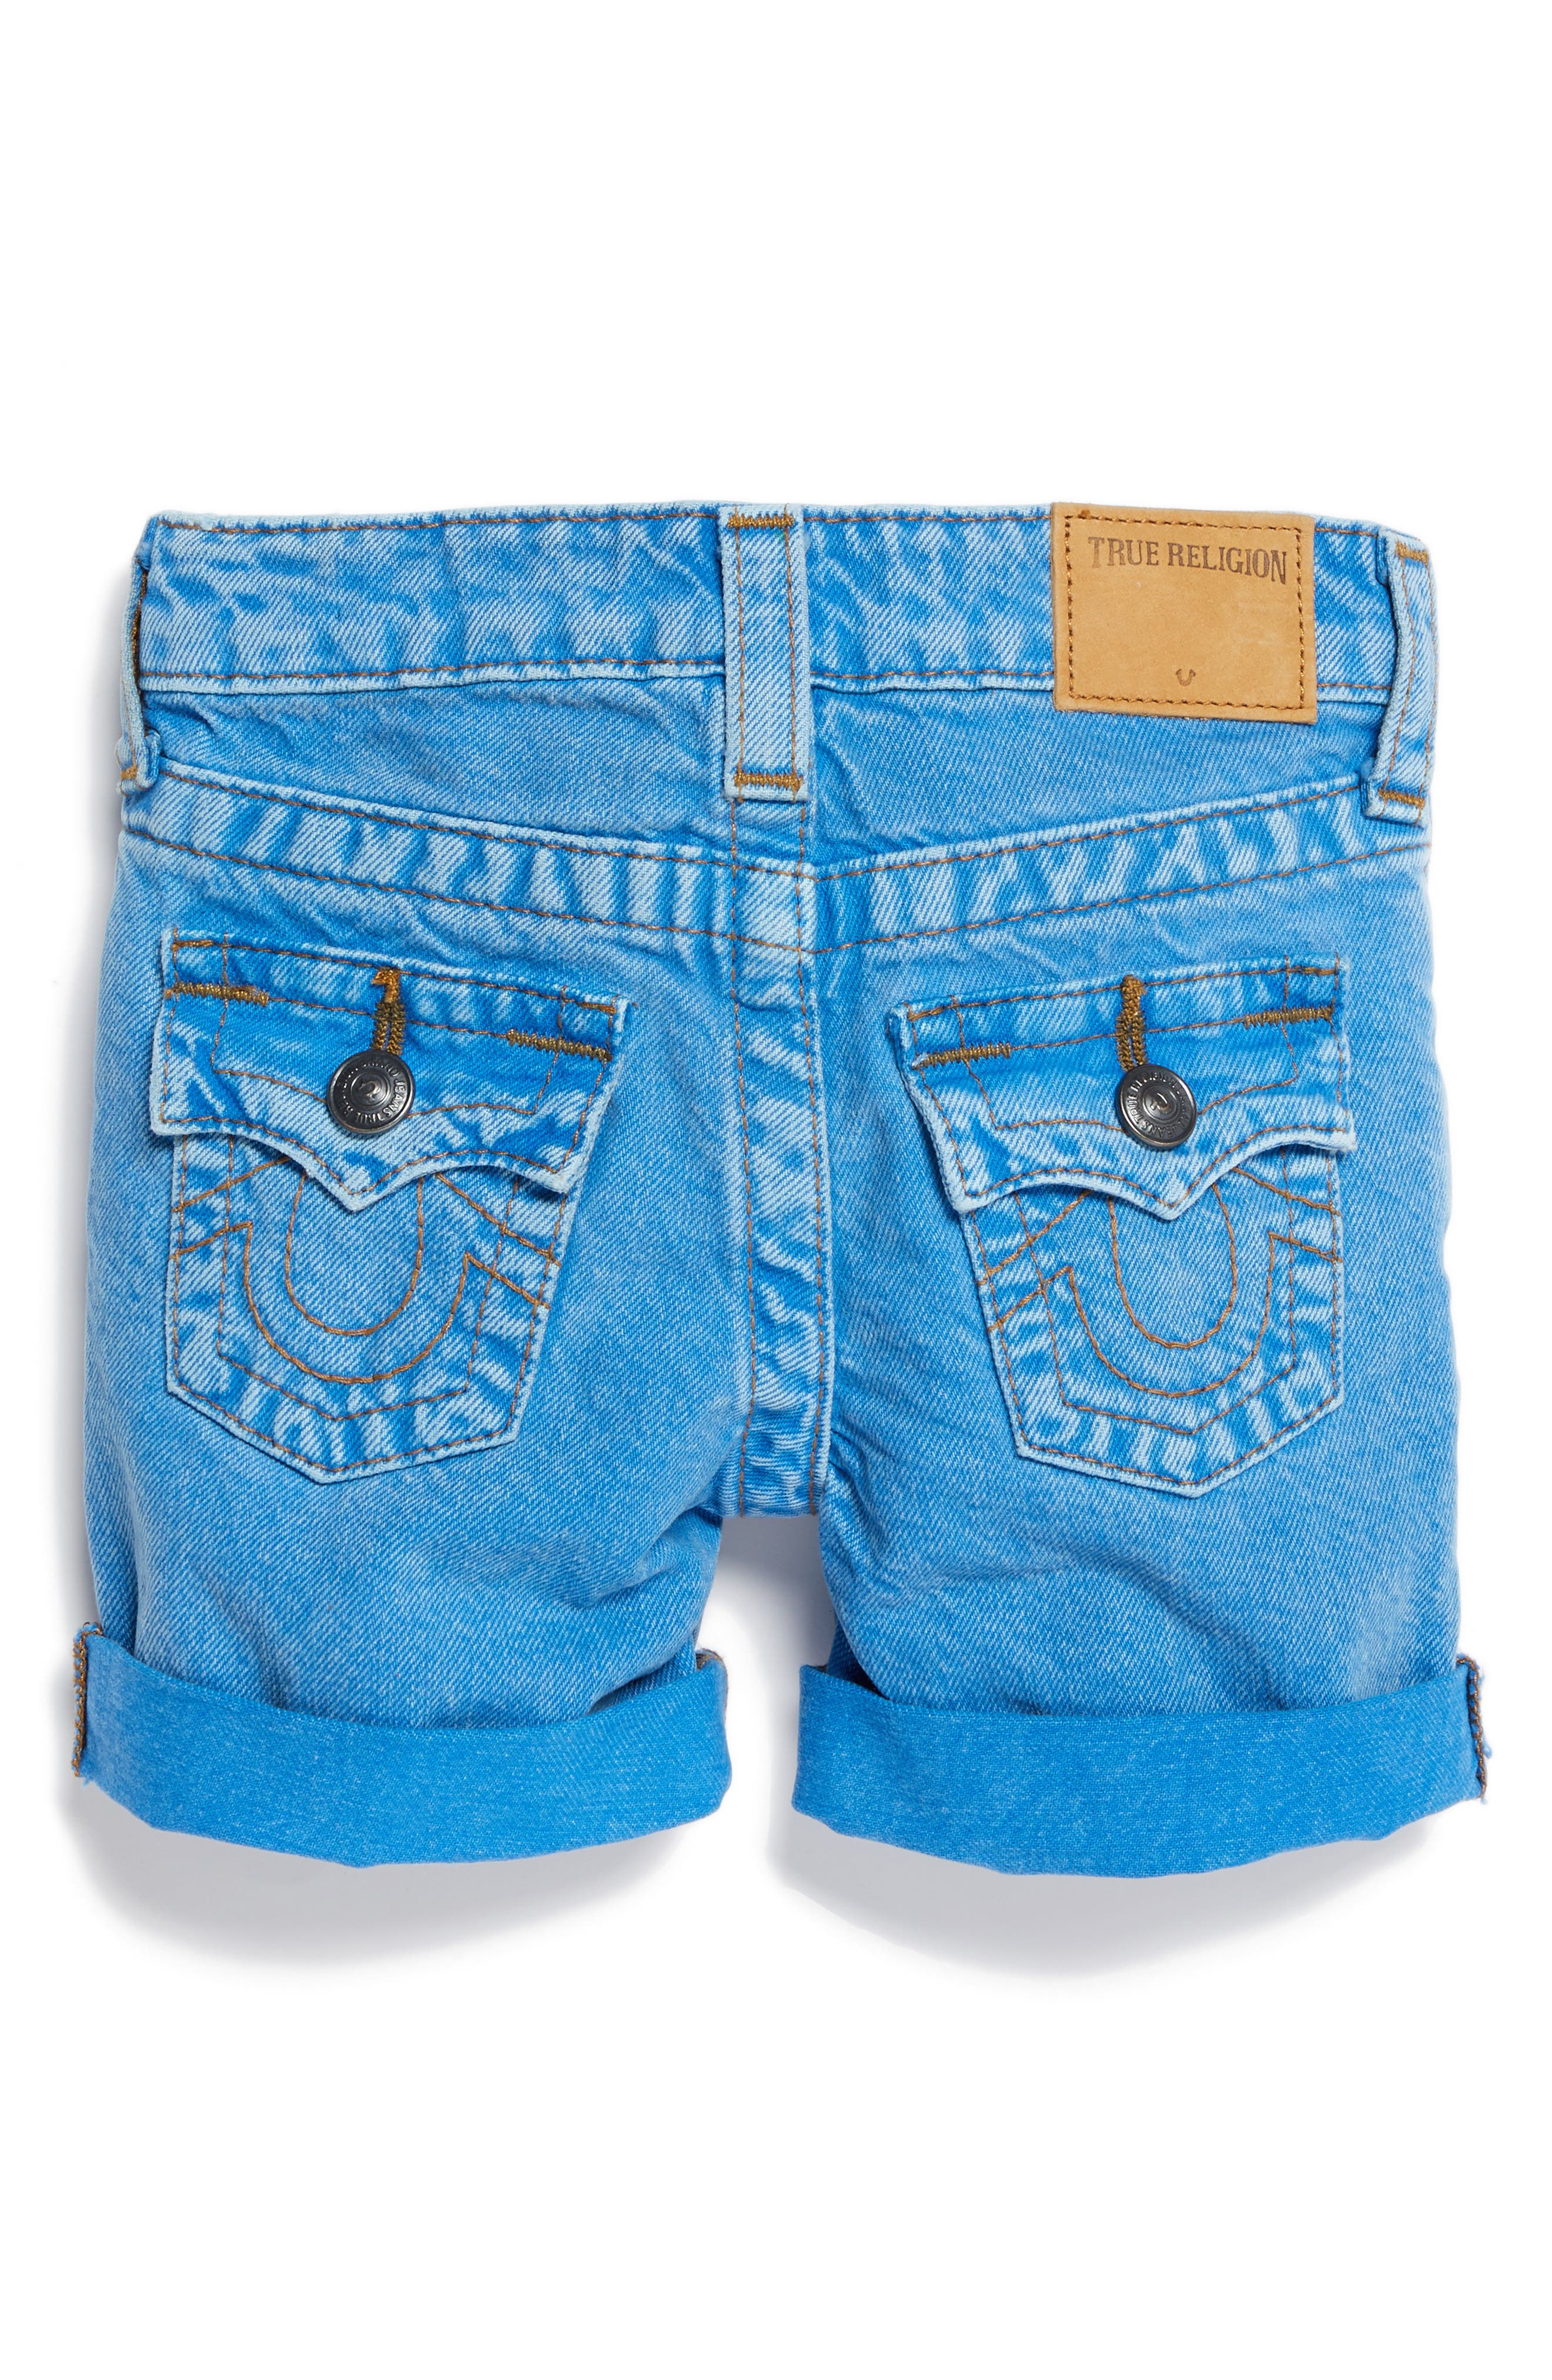 True Religion Geno Denim Shorts,                         Main,                         color, 437